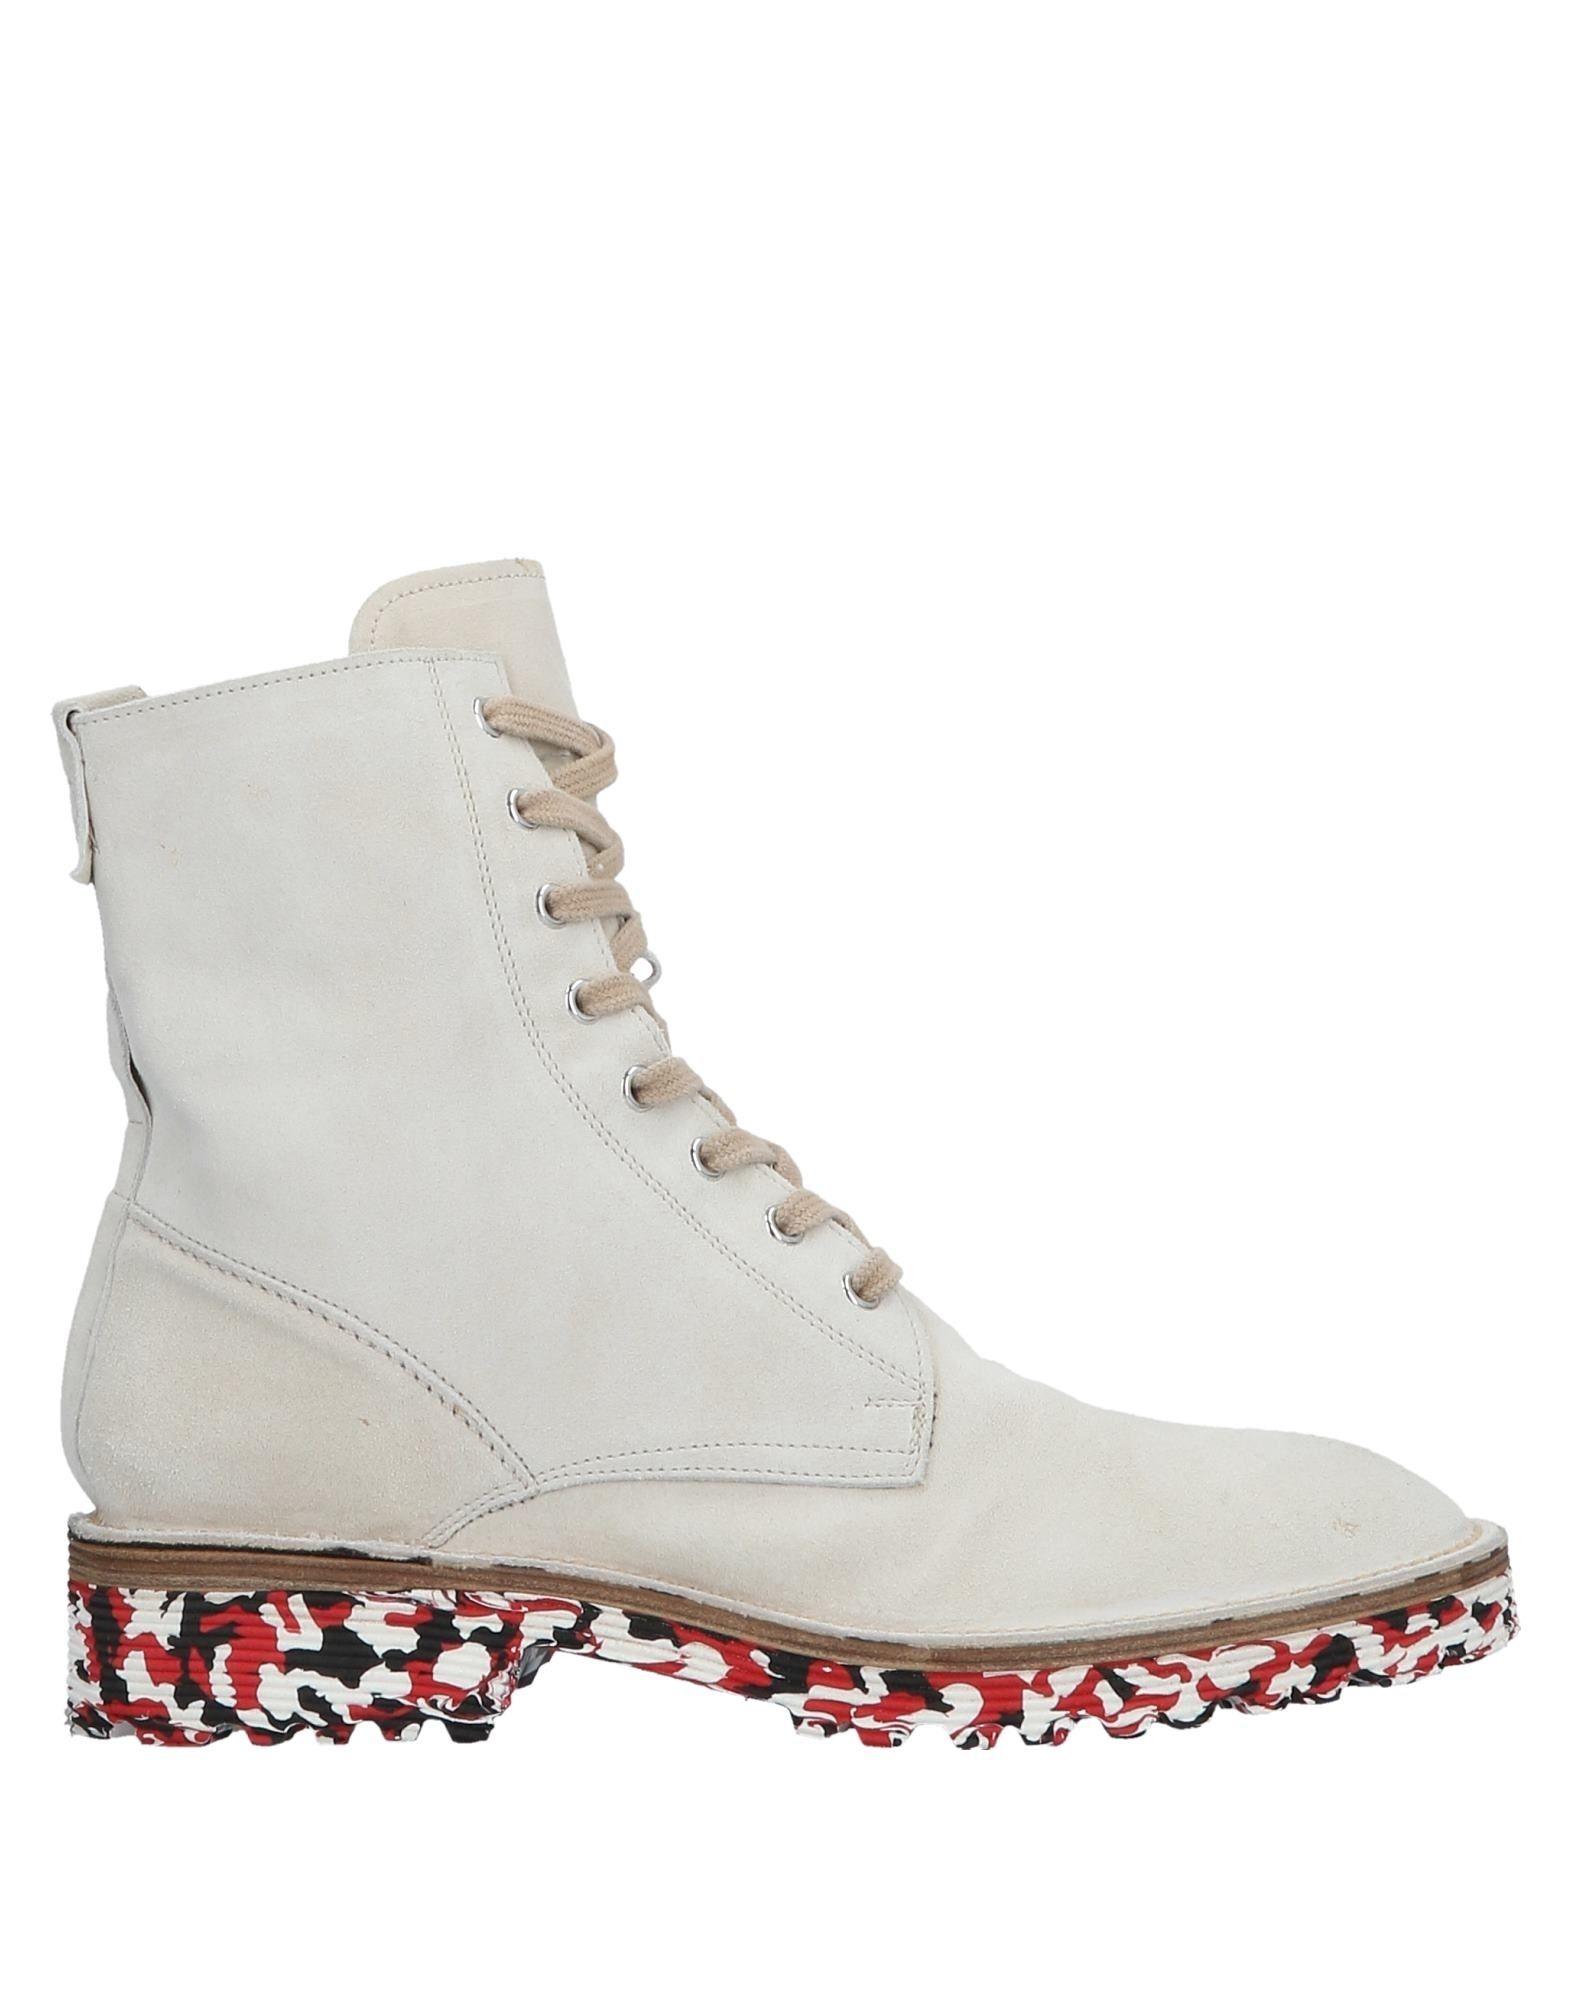 Stilvolle billige Schuhe 11536042RS Barracuda Stiefelette Damen  11536042RS Schuhe 08fbbe